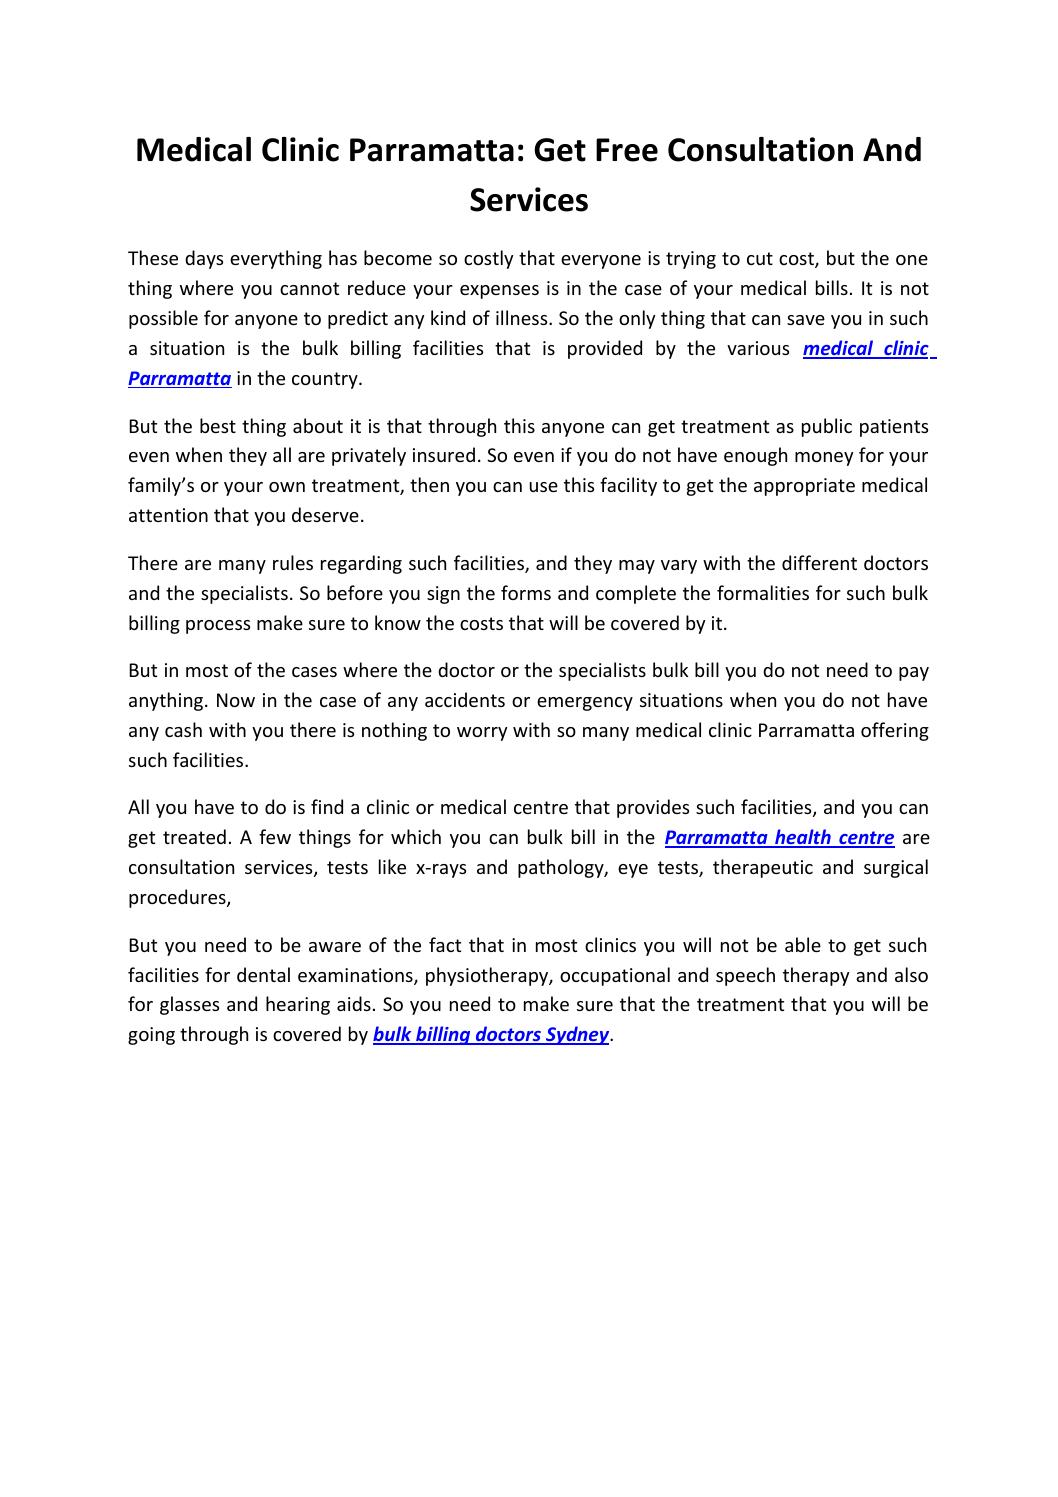 Medical Clinic Parramatta: Get Free Consultation And